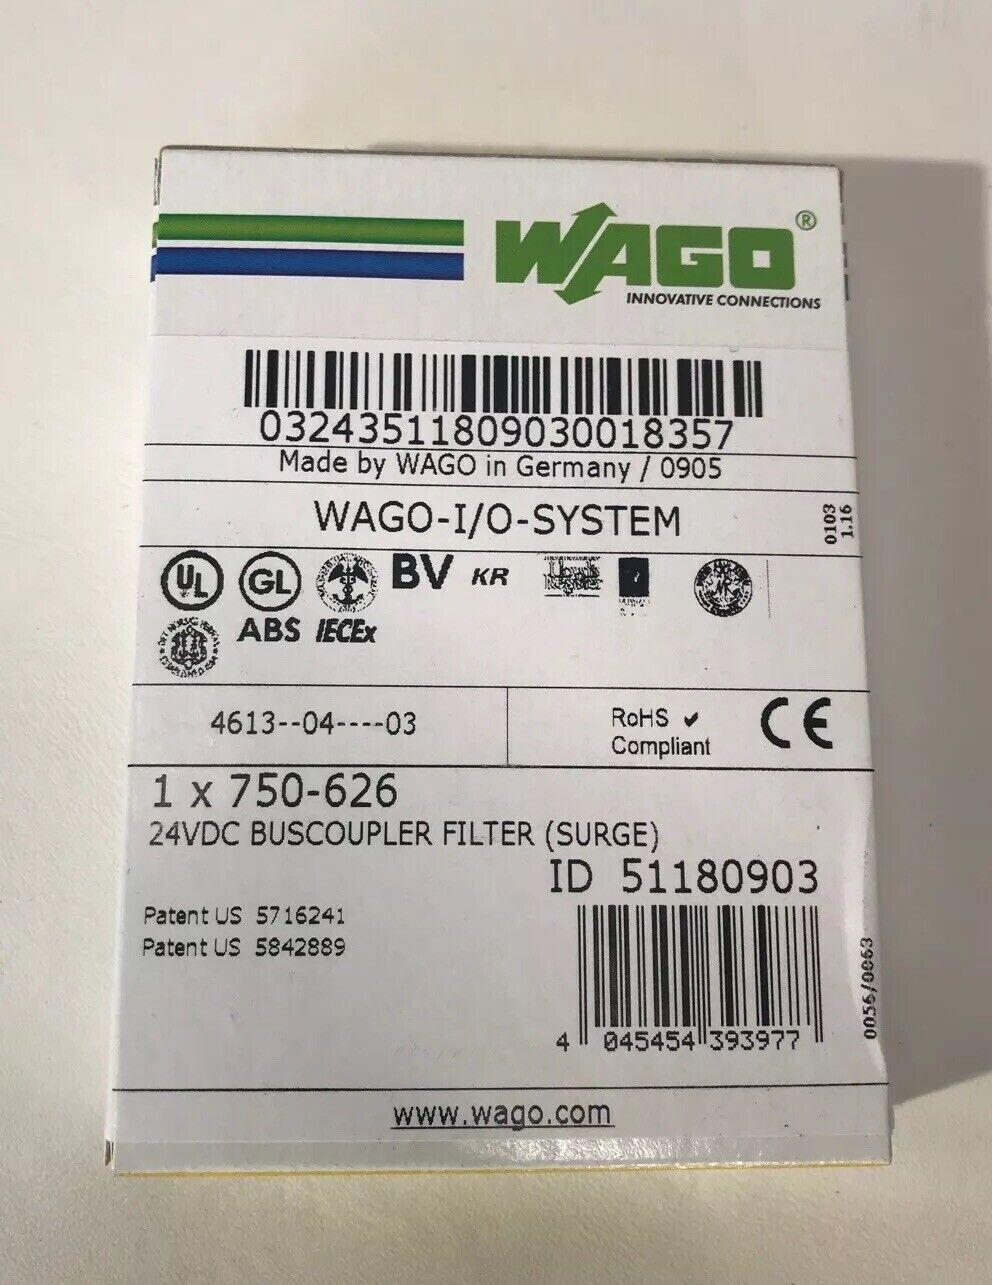 Surge UNUSED Wago 750-626 24 V DC Power Supply Filtre